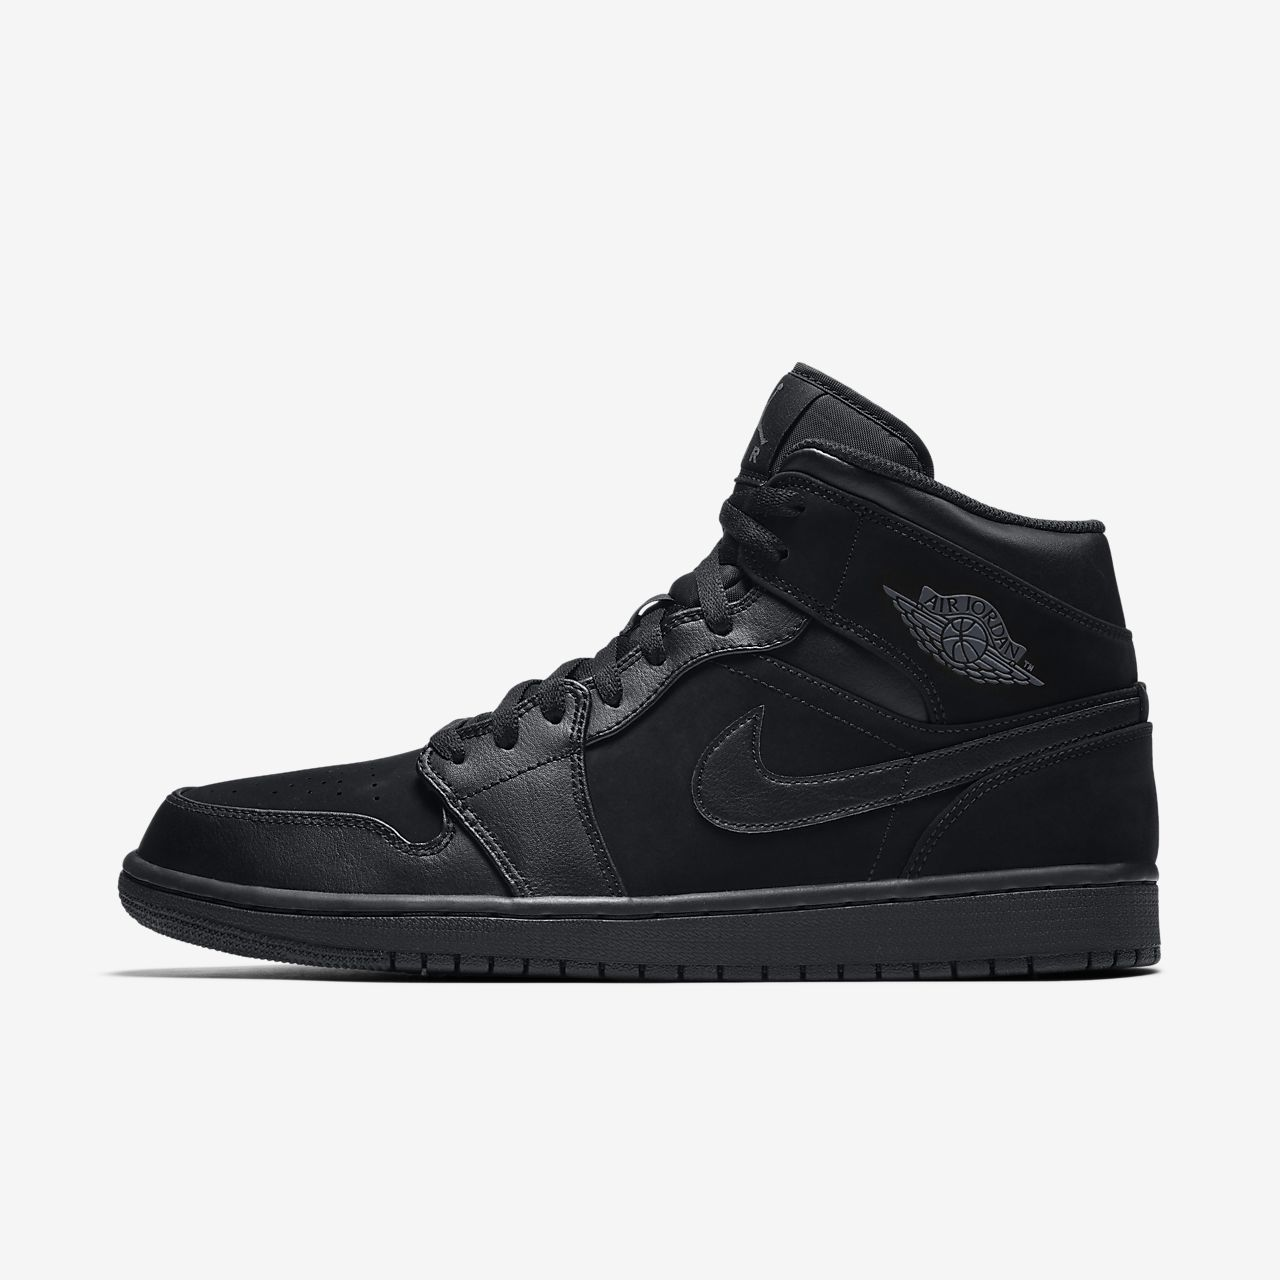 Air Jordan 1 Zapatillas de correr